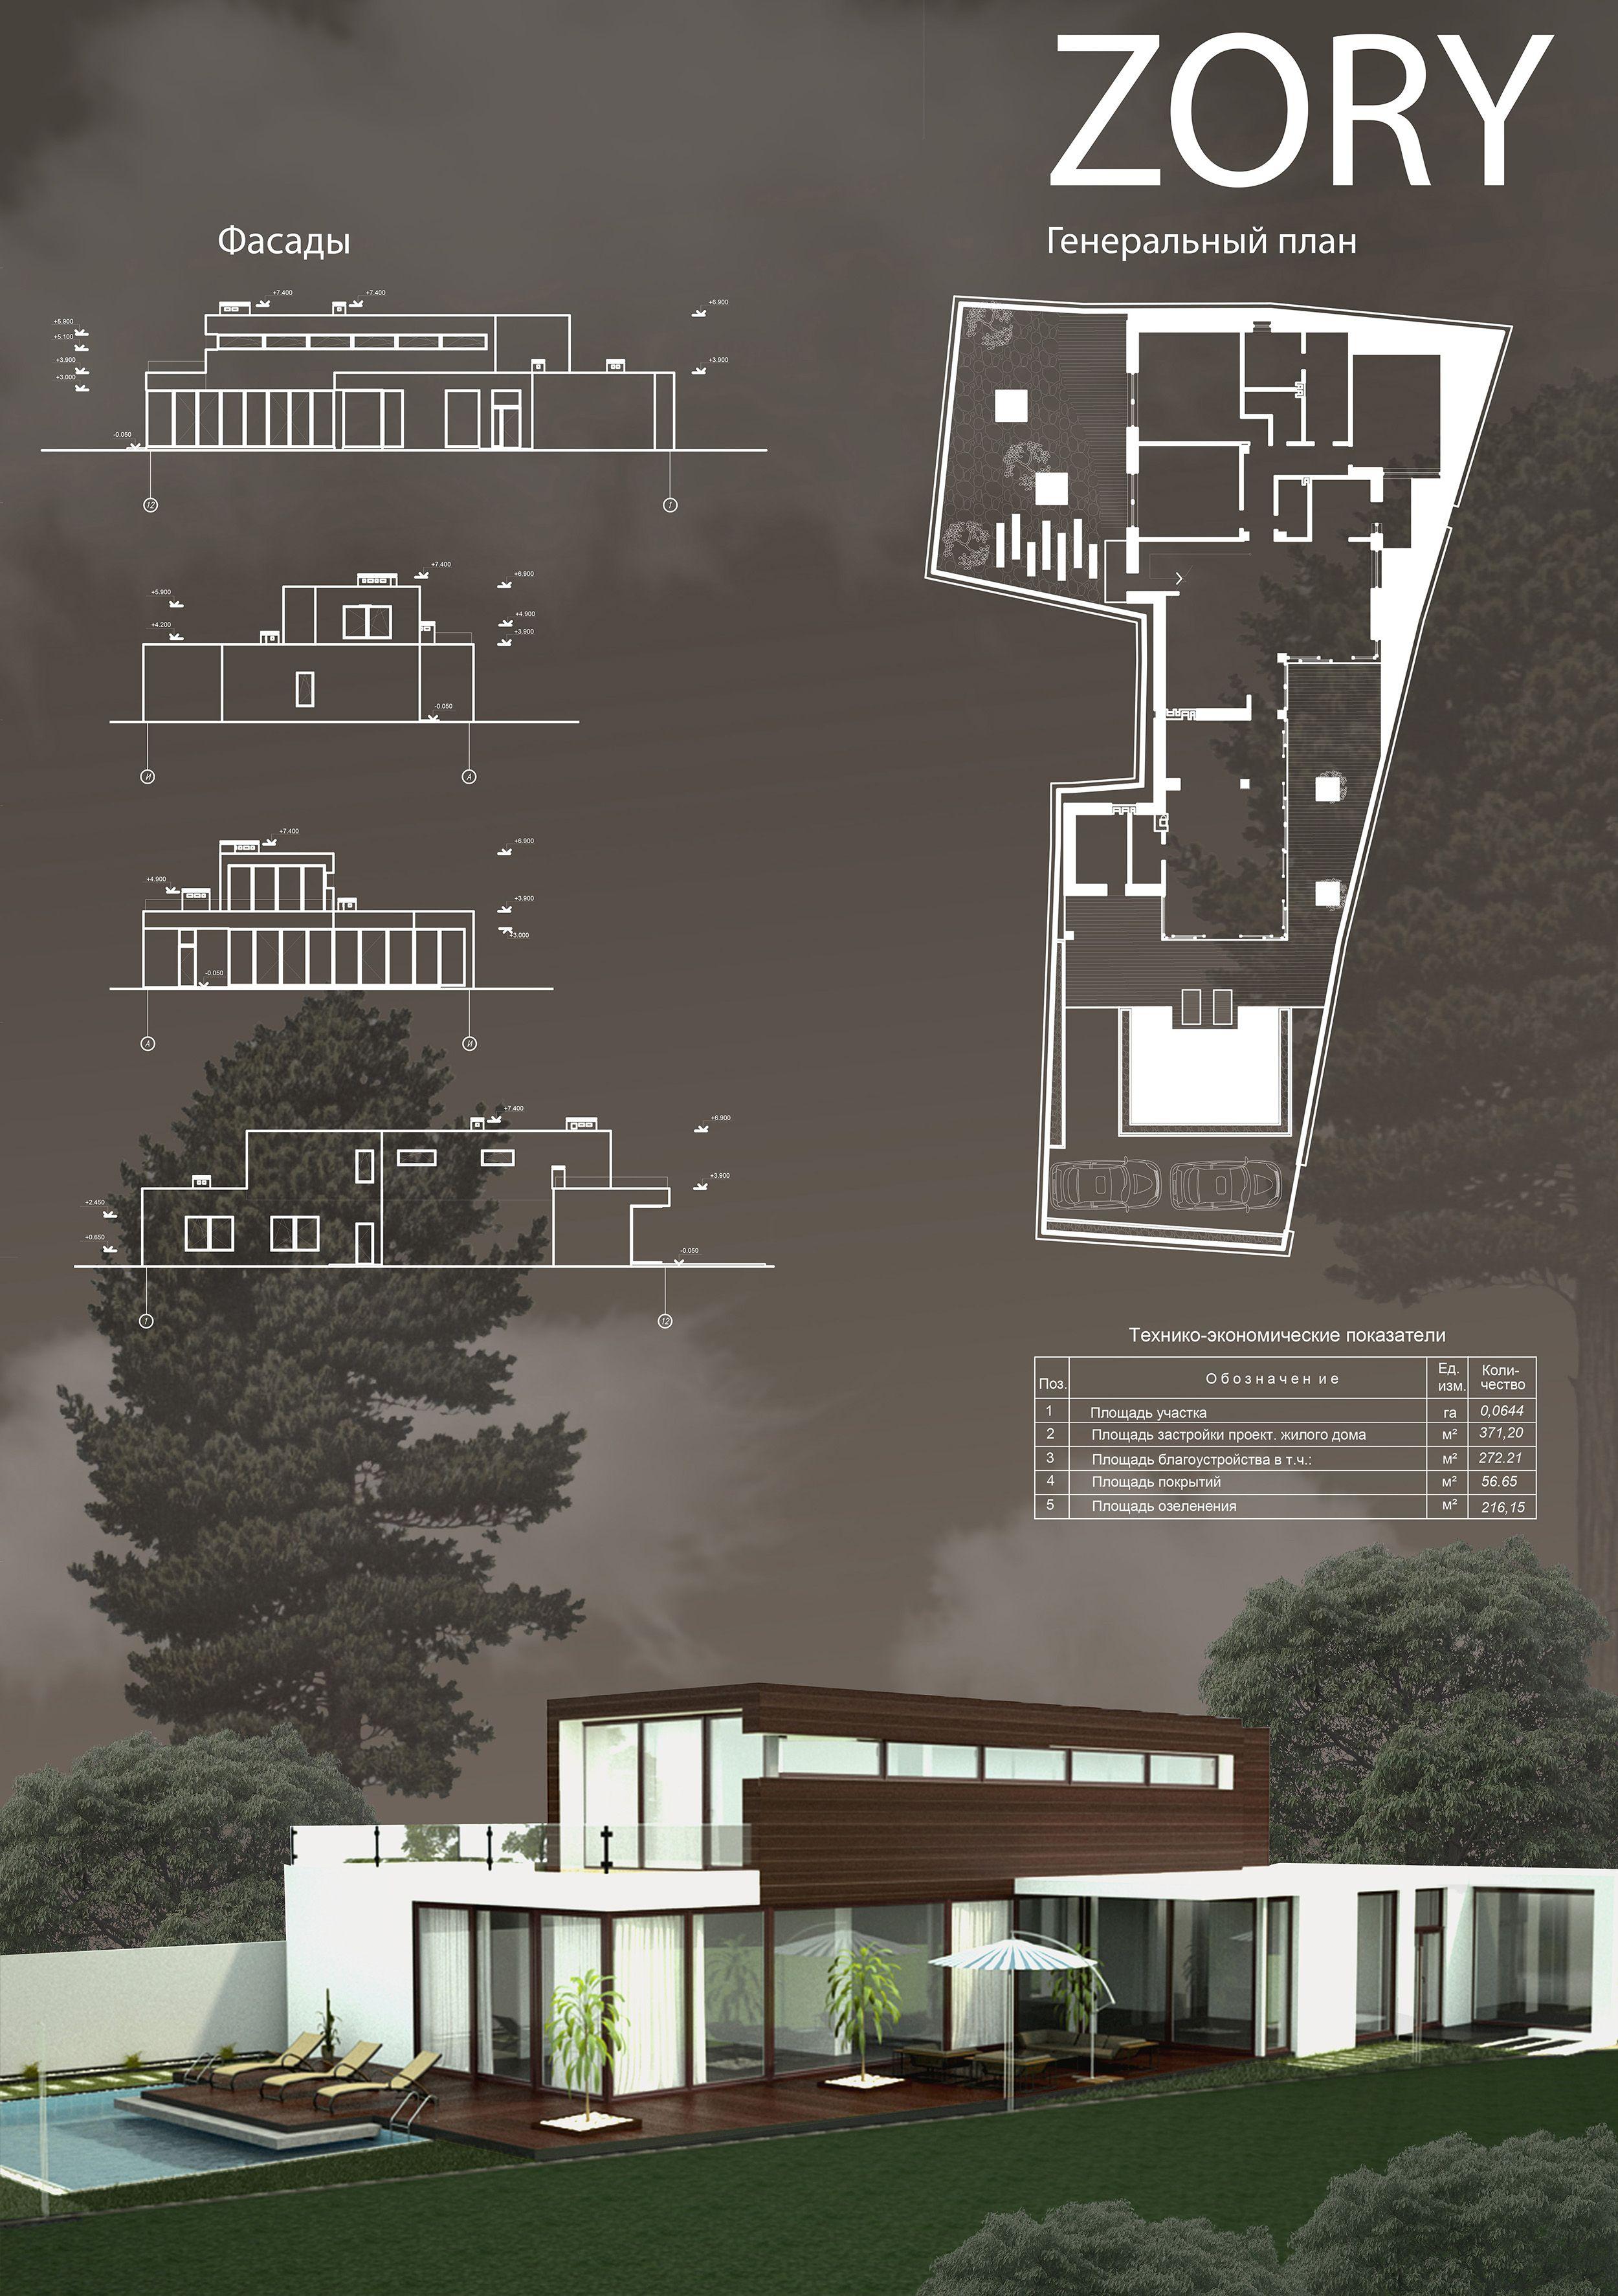 Pin de post scriptum en pinterest for Laminas arquitectura